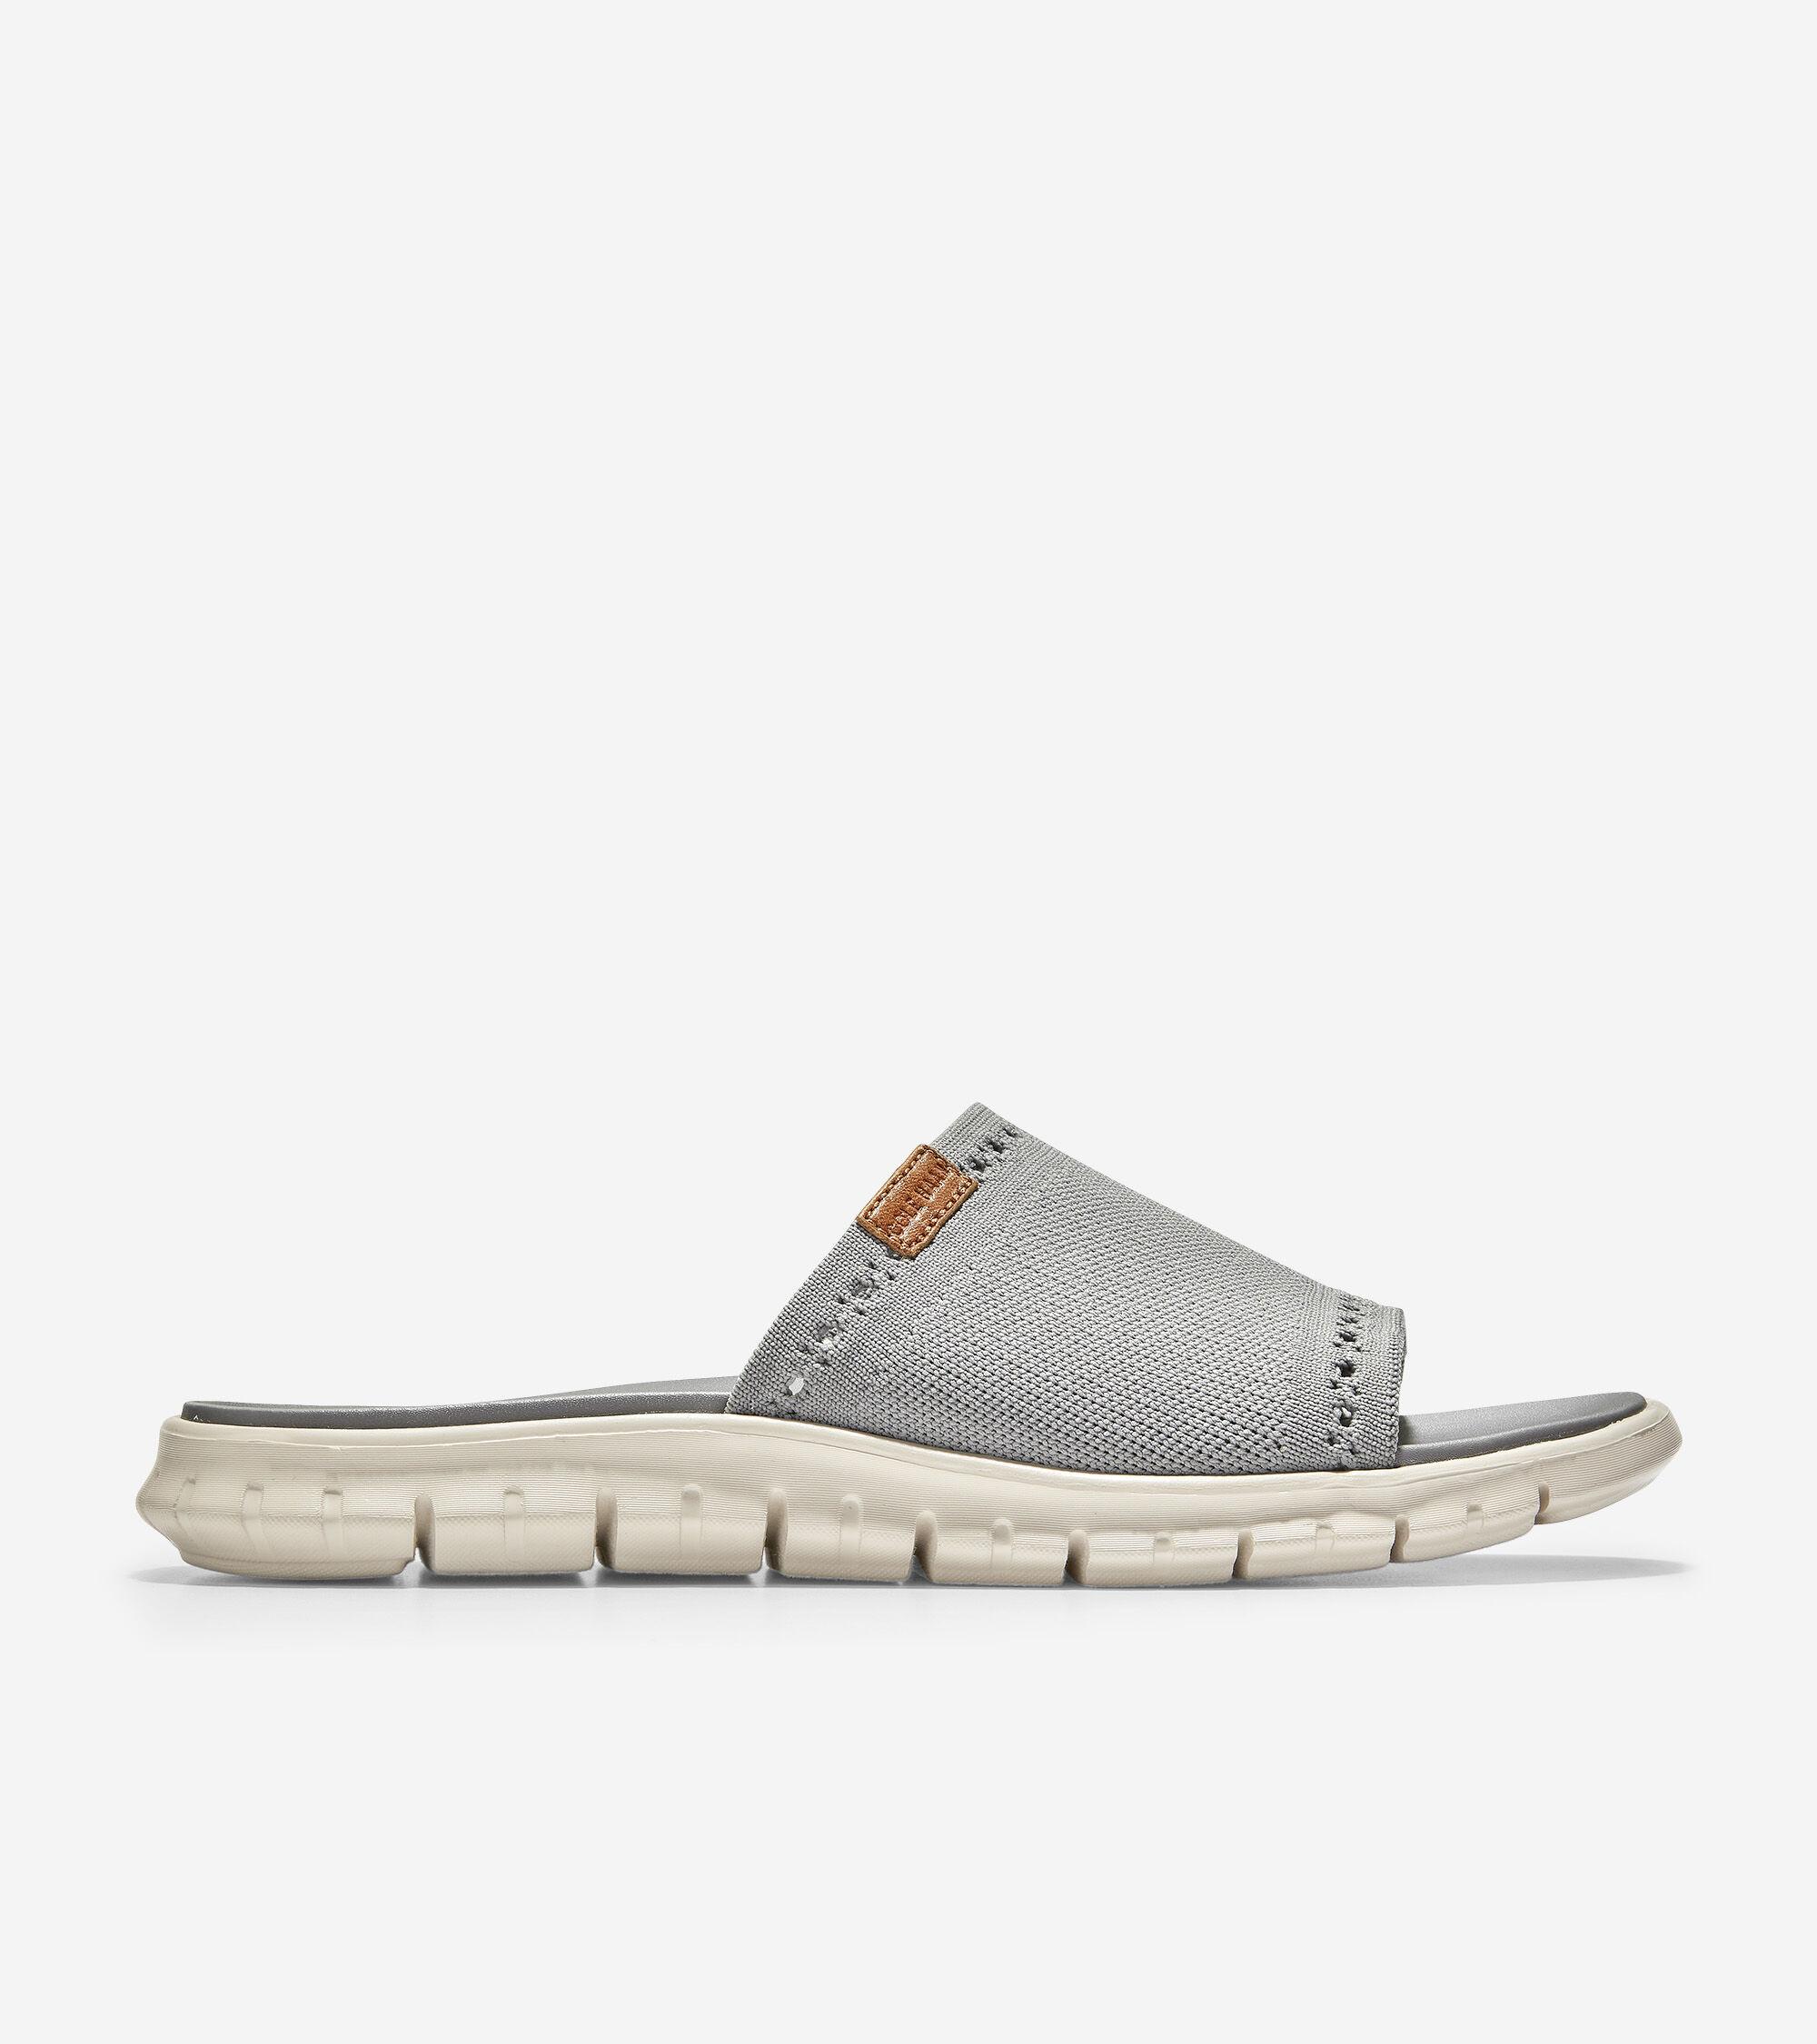 0c728424b697 Men s ZEROGRAND Slide Sandals with Stitchlite™ in Ironstone